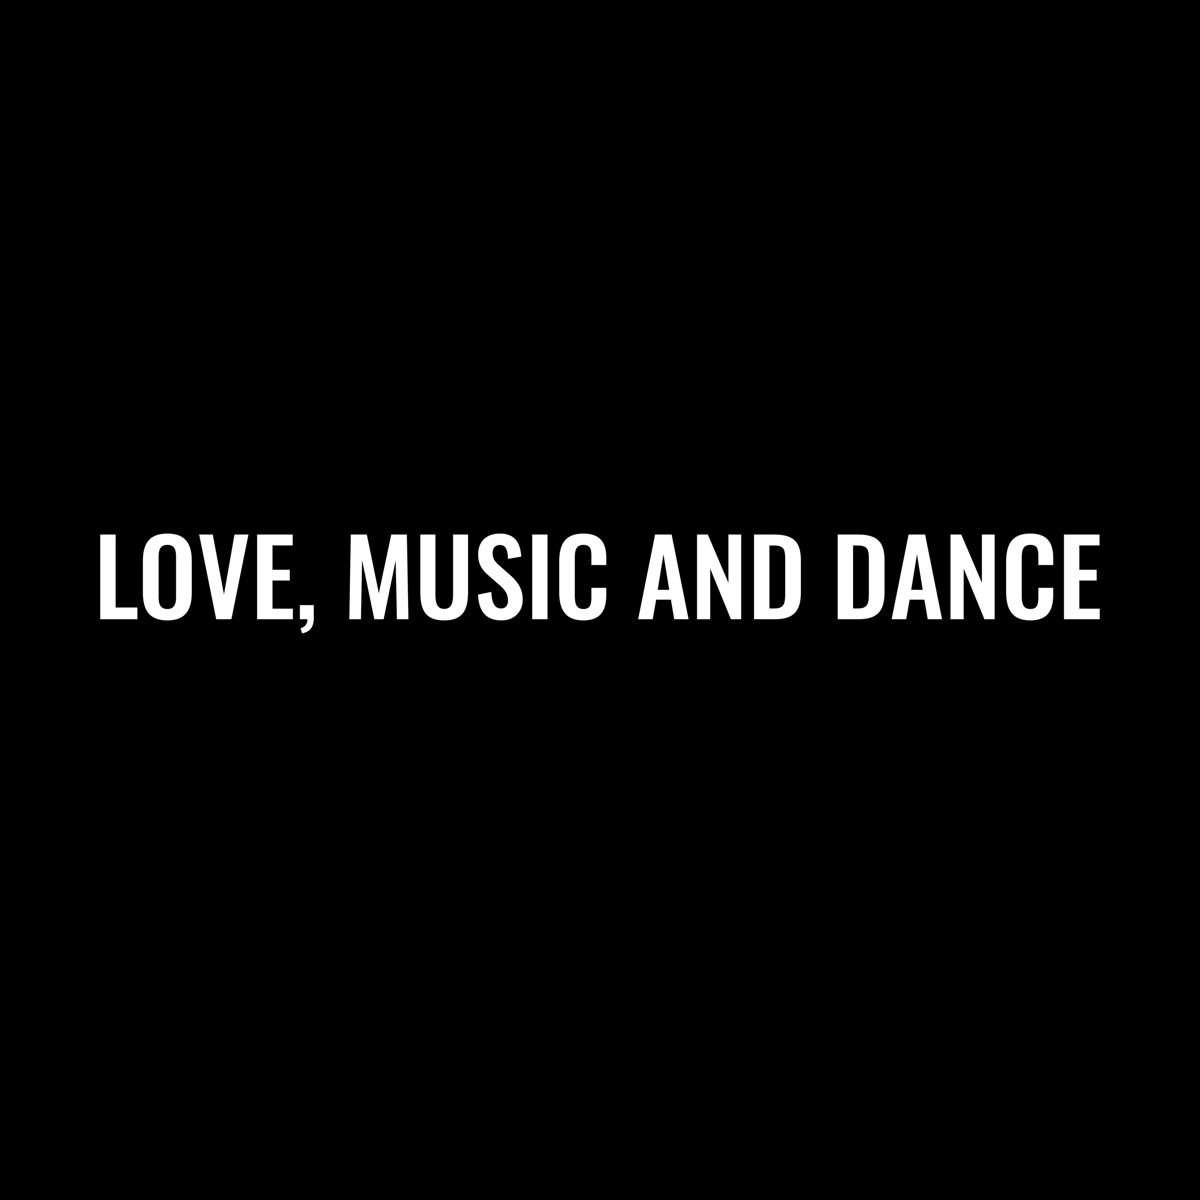 『ALI - FEELIN' GOOD feat. 梅田サイファー(KOPERU, peko, KZ, R-指定) 歌詞』収録の『LOVE, MUSIC AND DANCE』ジャケット